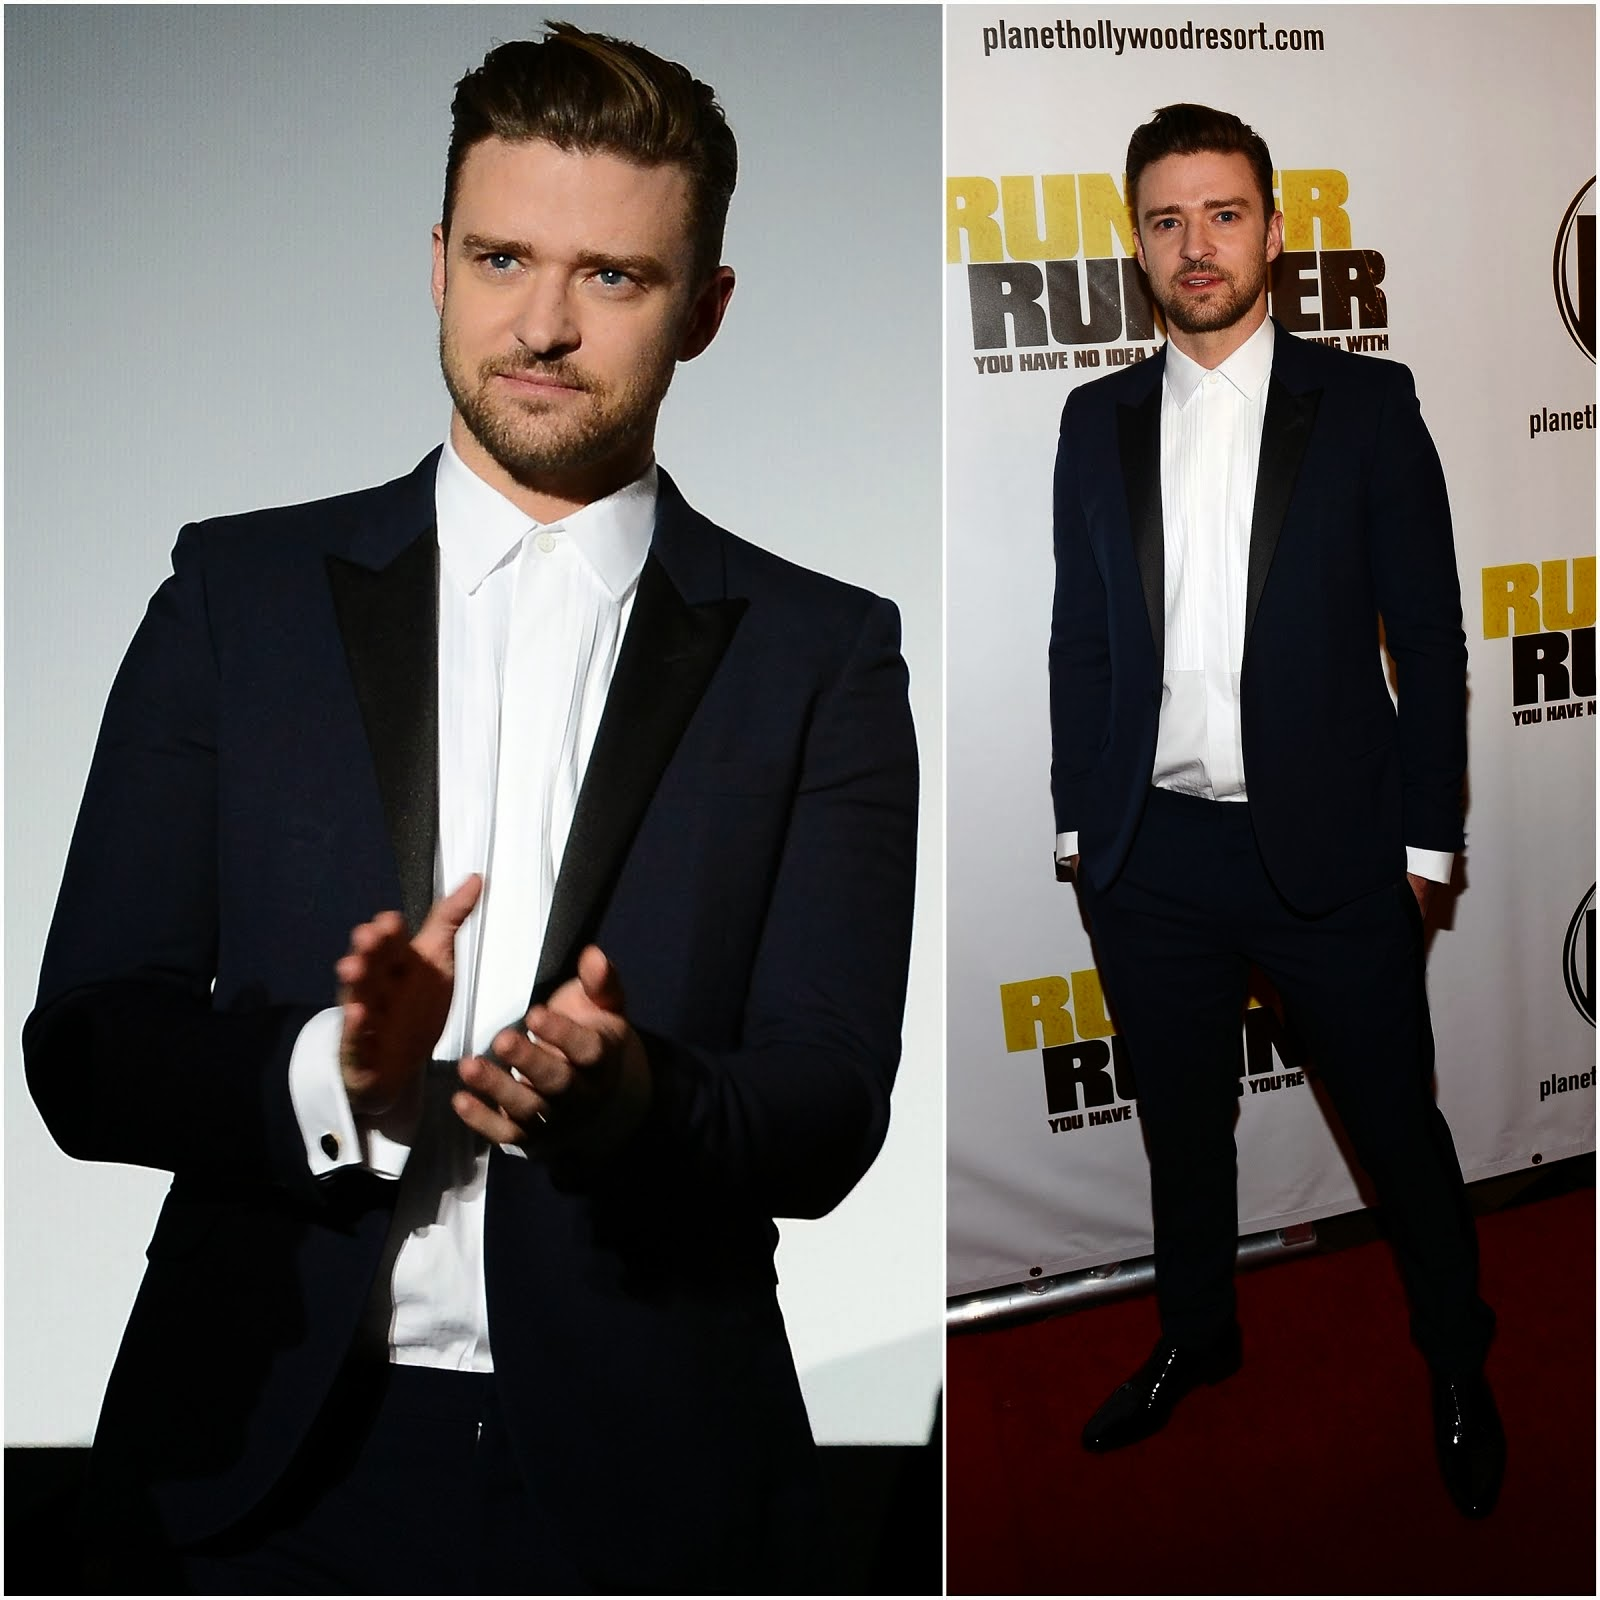 00O00 Menswear Blog: Justin Timberlake in Saint Laurent - 'Runner Runner' Premiere, Las Vegas